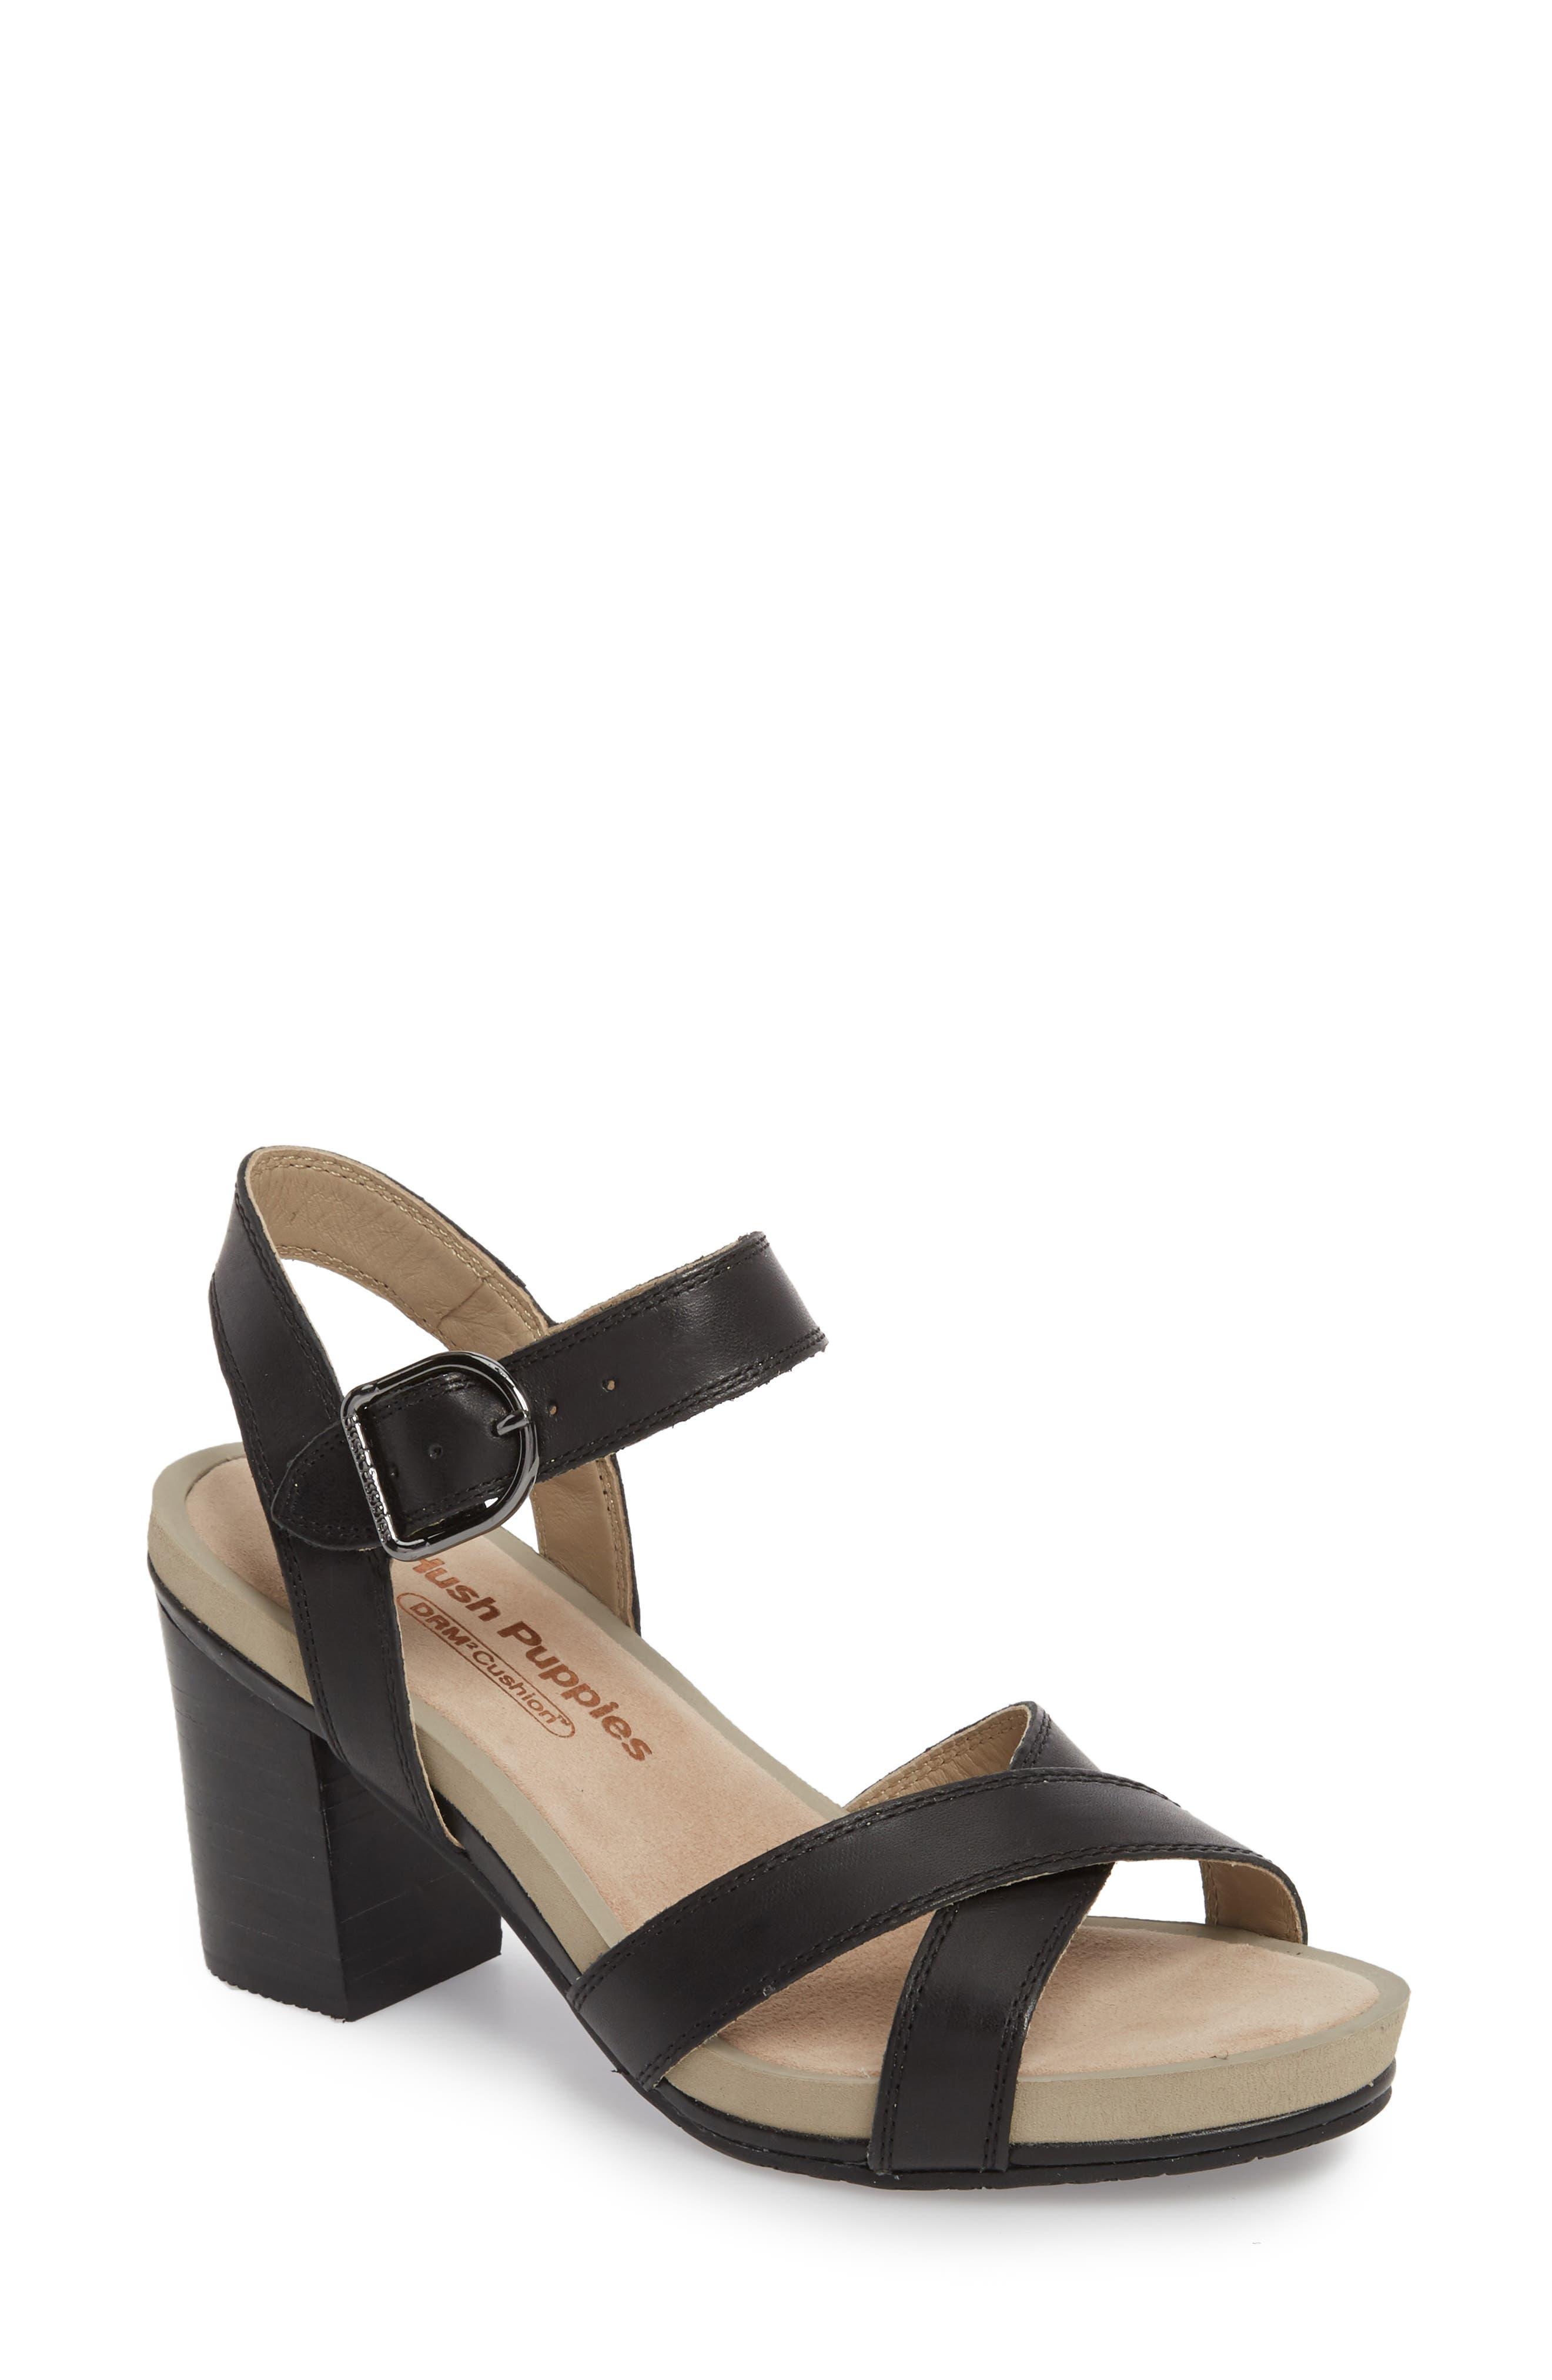 Mariska Block Heel Sandal,                             Main thumbnail 1, color,                             Black Leather